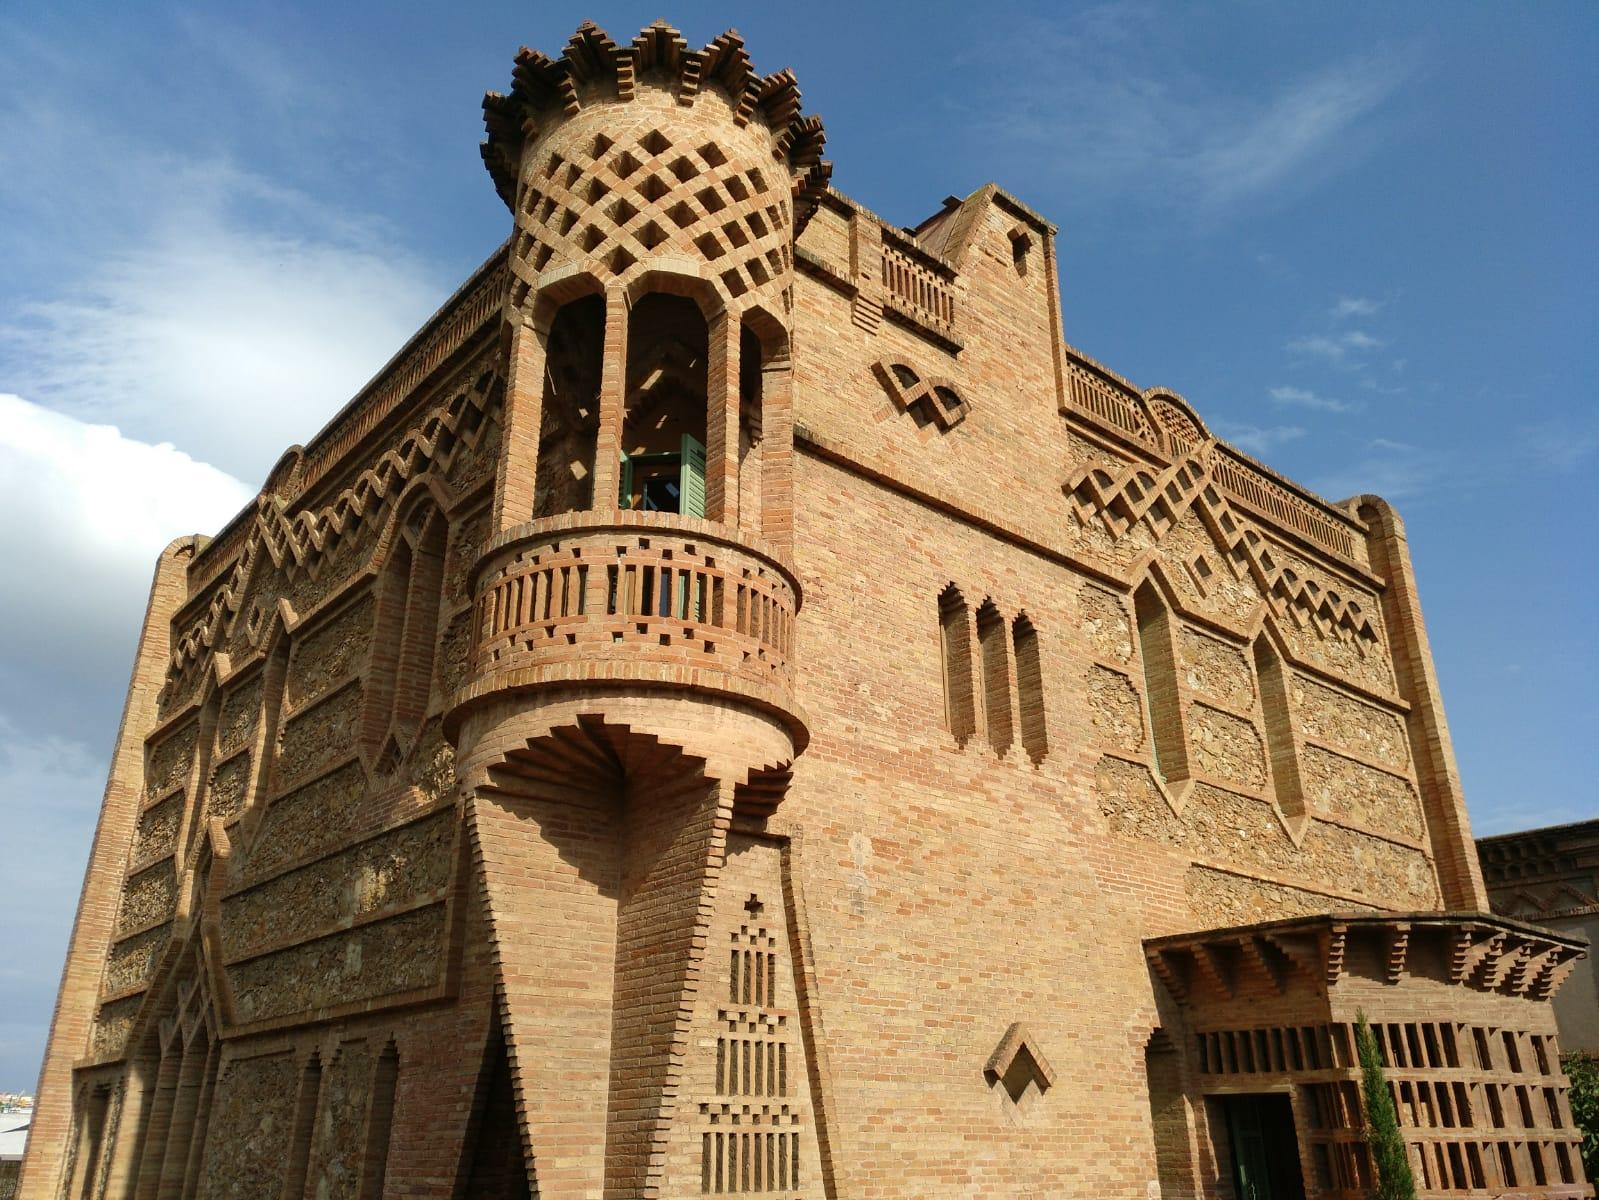 Visita a la Cripta Gaudí i a la Colònia Güell